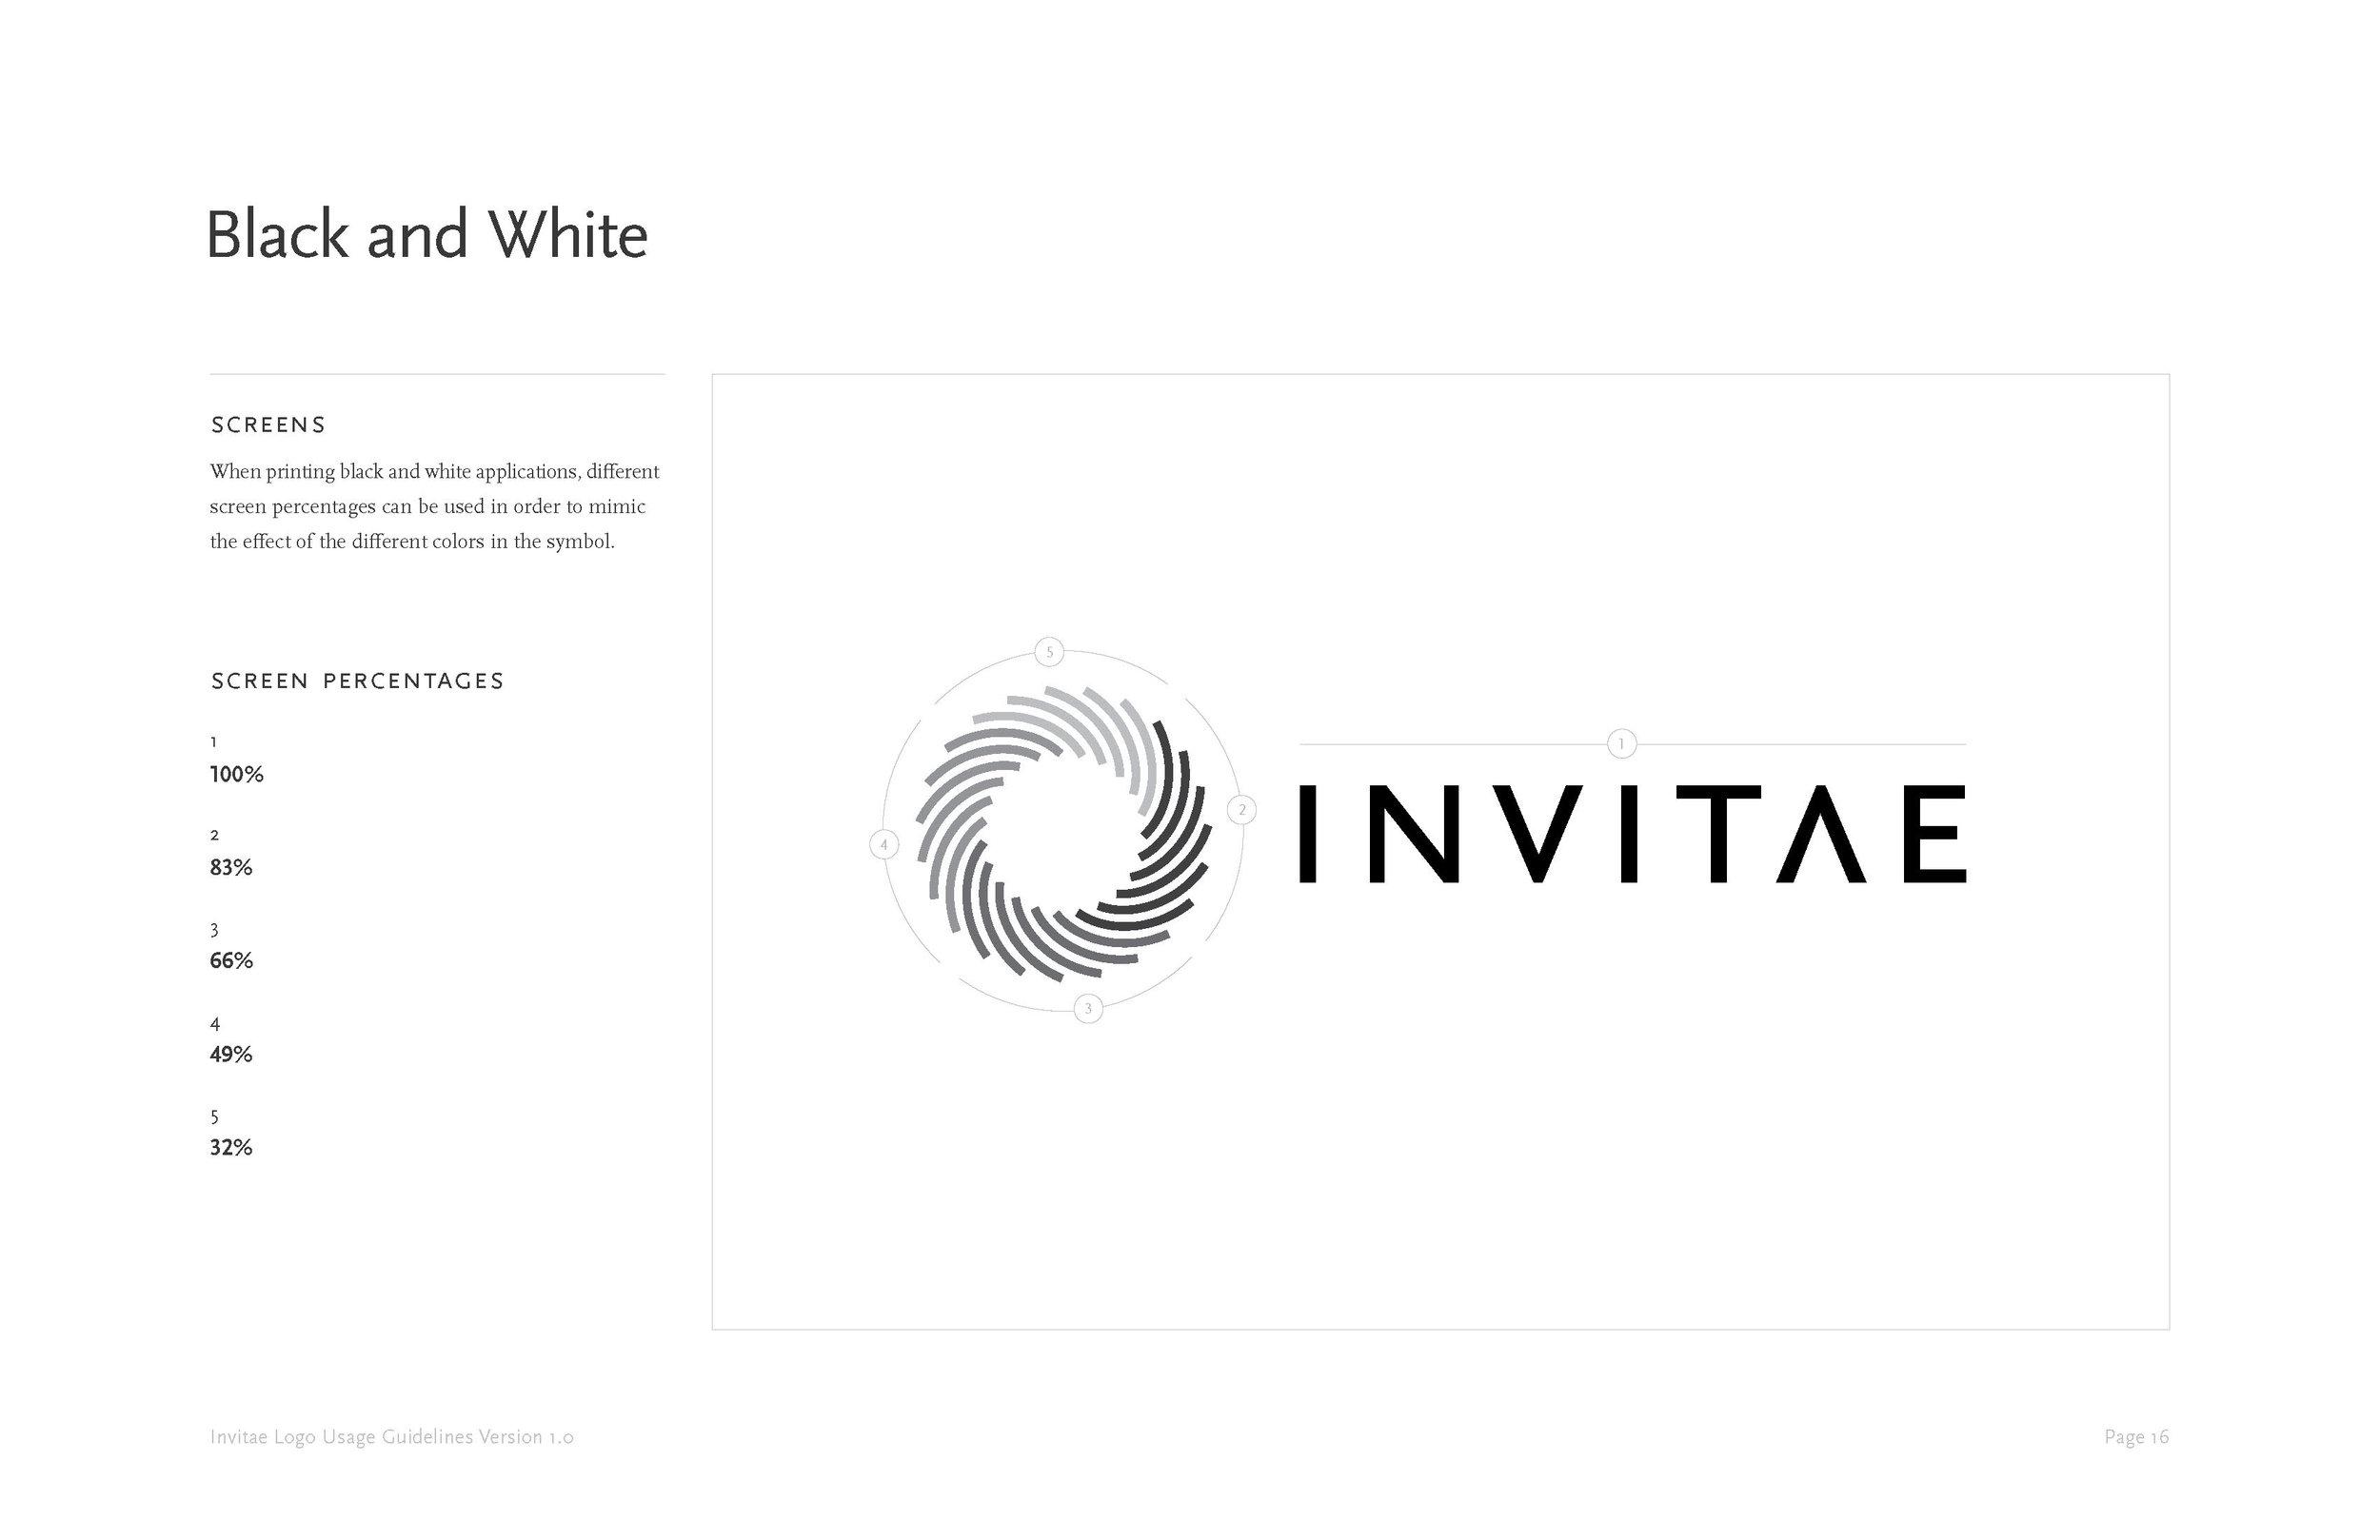 Invitae_logo_guidelines_Page_18.jpg